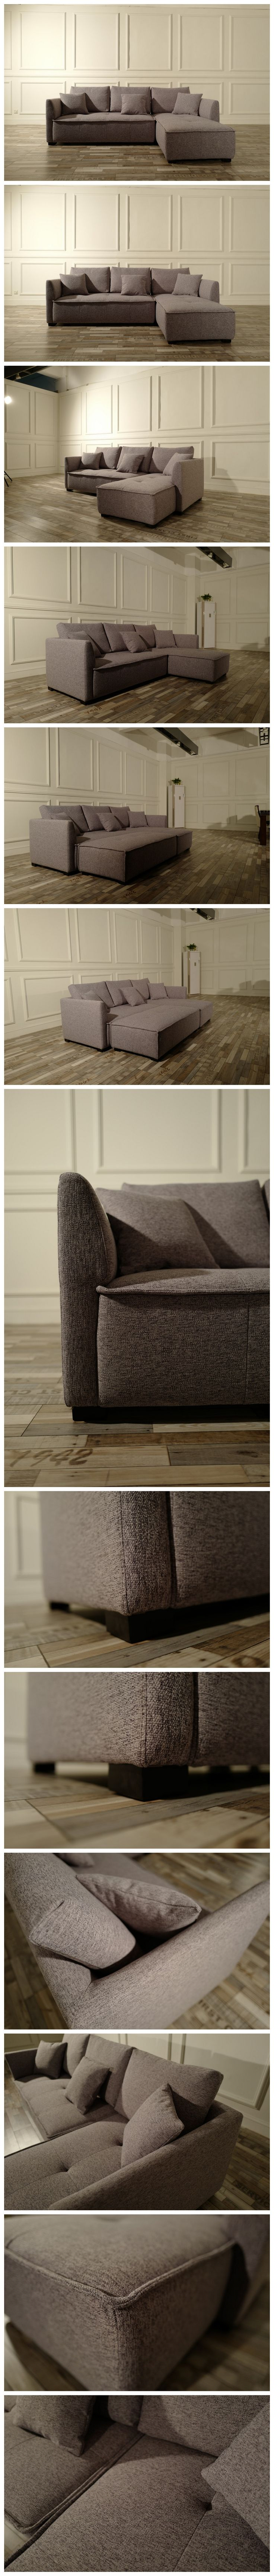 High quality wholesale wood sofa set modern furniture pictures  new design modern sofa set #sofaset #sofa #cocheen #modernsofa #cocheendesign #livingroomsofa #furniture #newdesign #sectionalsofa #homefurniture #couch #furniturefactory #CIFF #cantonfair  contact:jennifer@cocheen.com  online store link: cocheenfurniture.en.alibaba.com